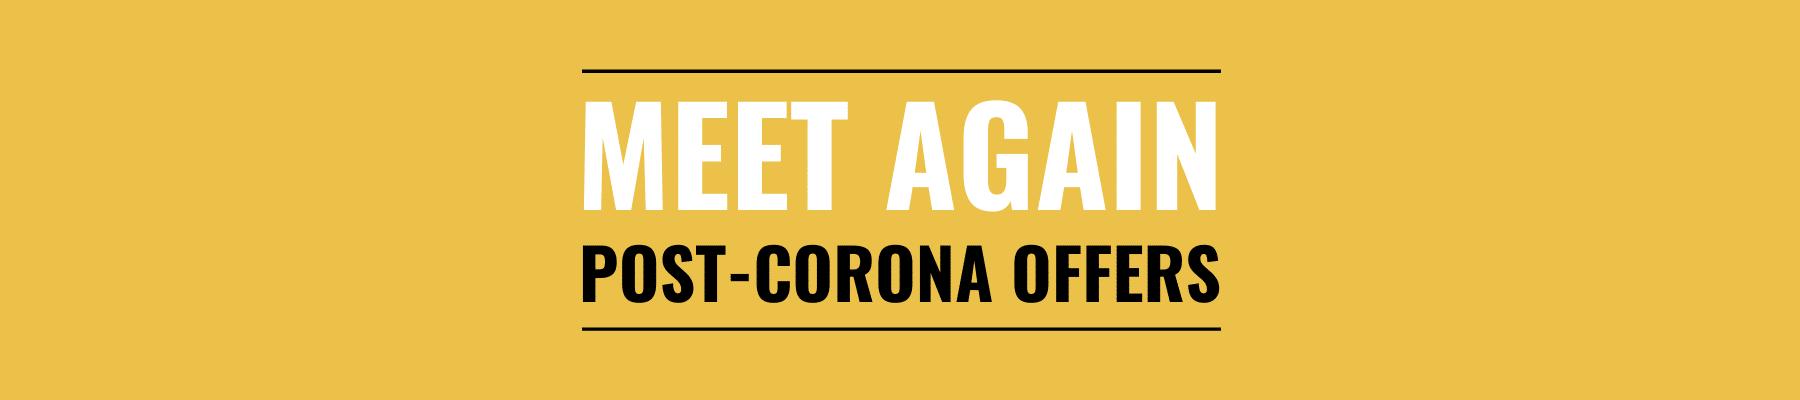 meet-again-post-corona-offers-kongres-magazine